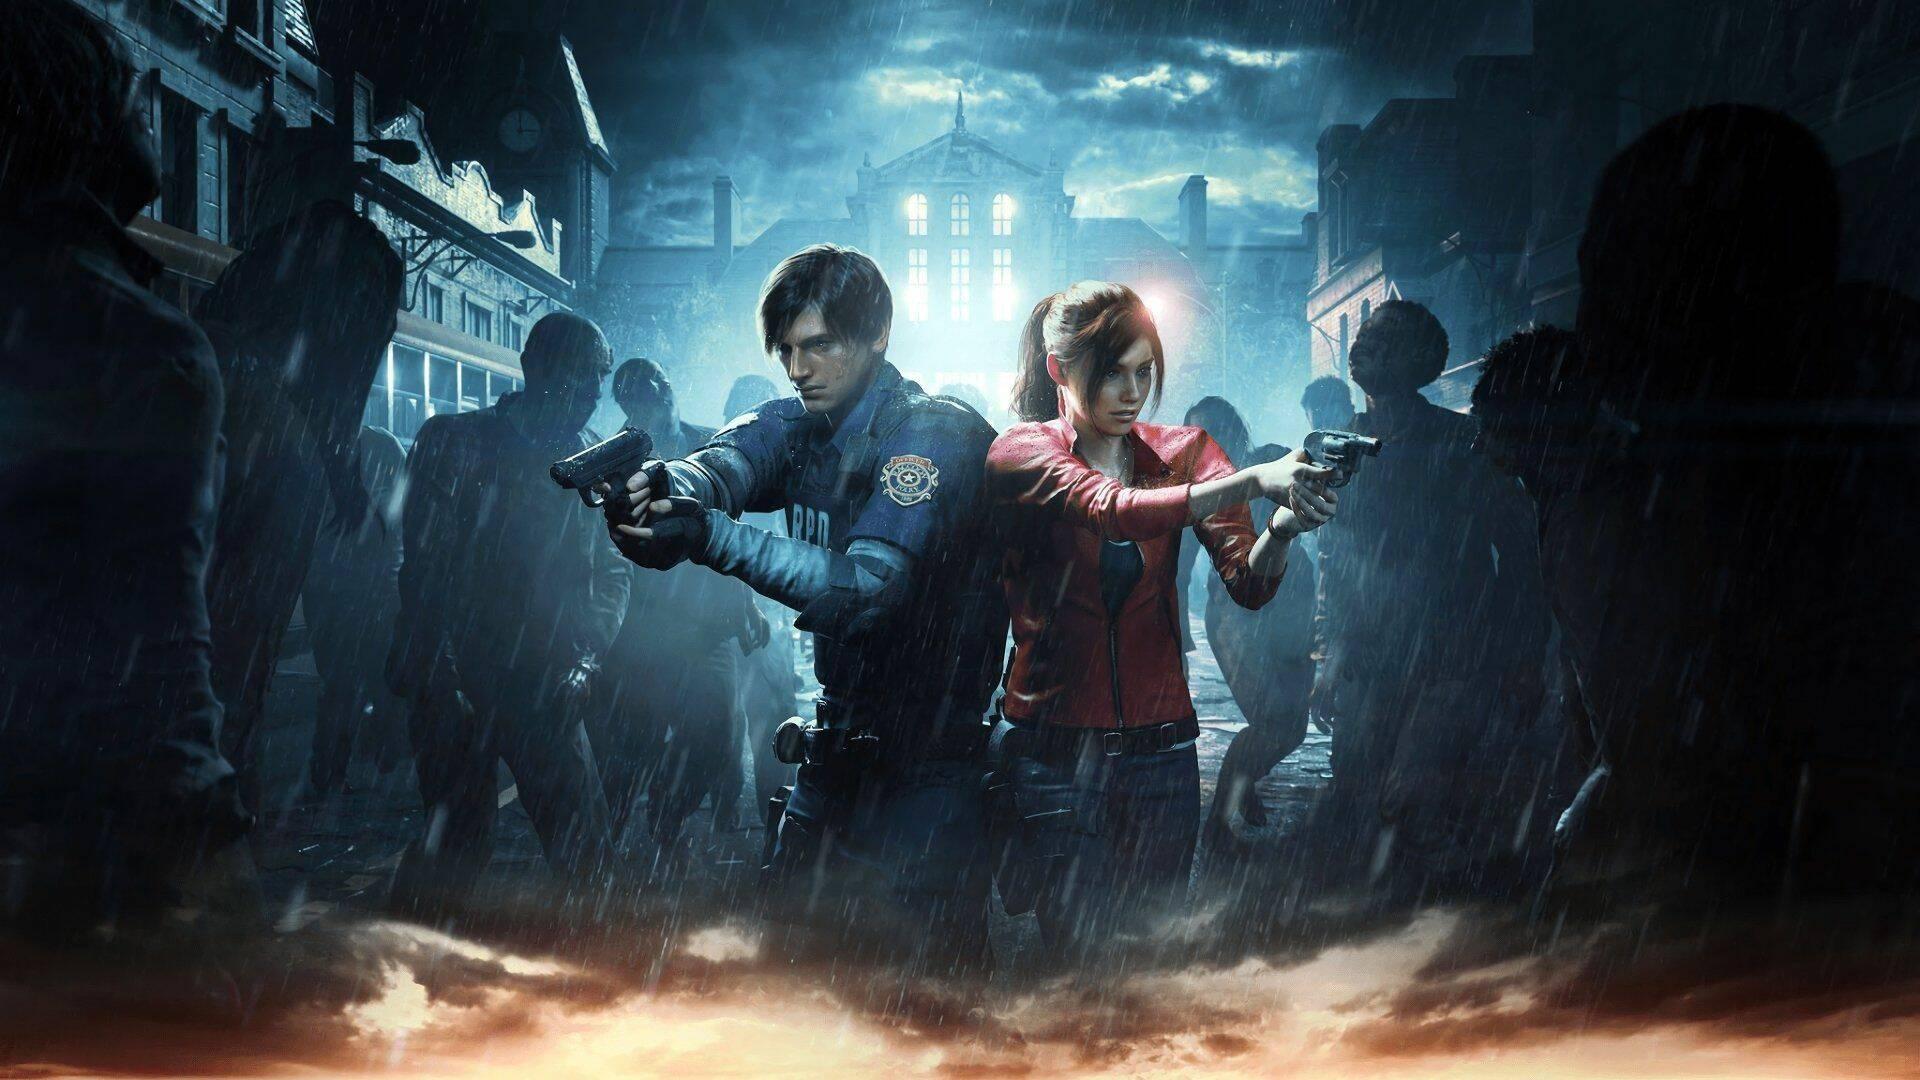 Resident Evil 7 superior to Resident Evil 2, Kotaku has no doubts